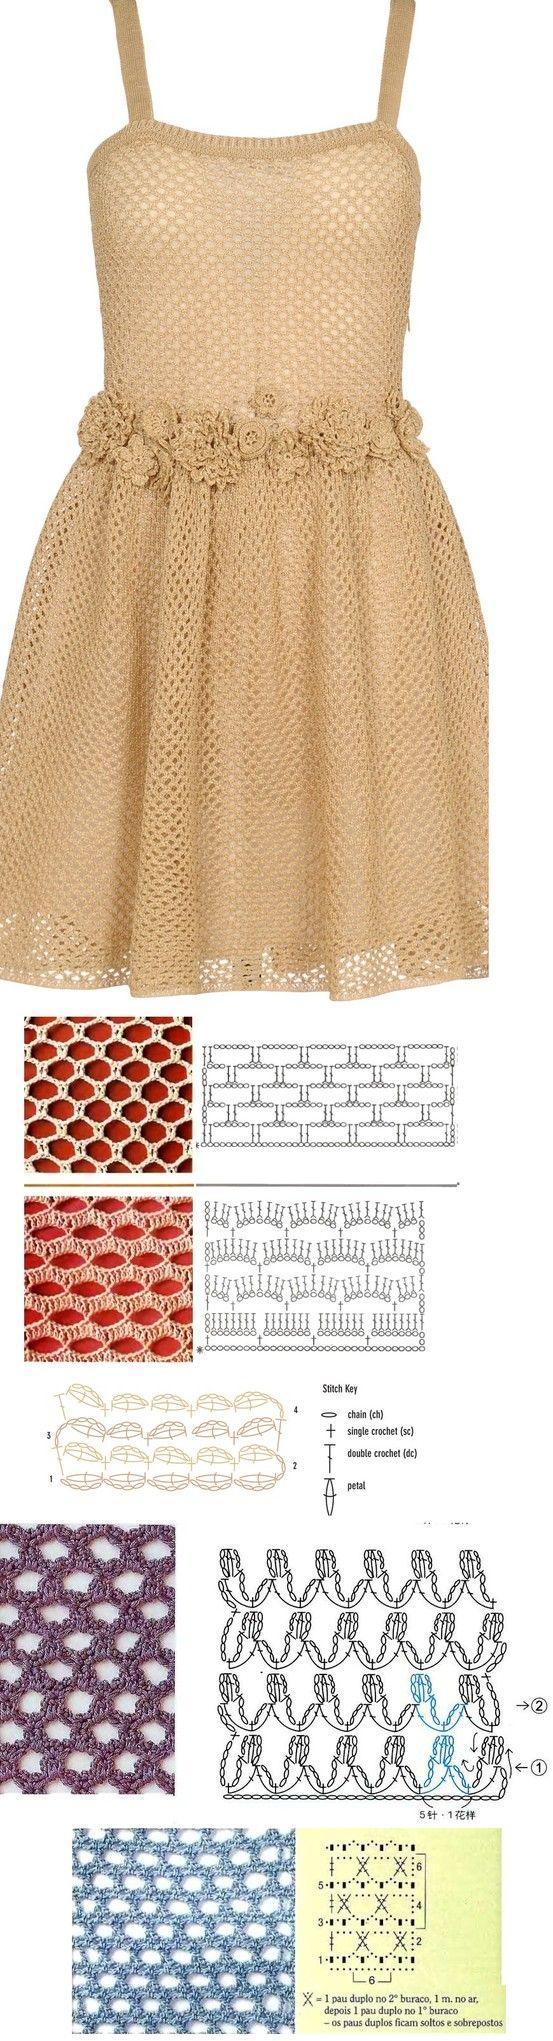 Crochet dress pattern with diagram